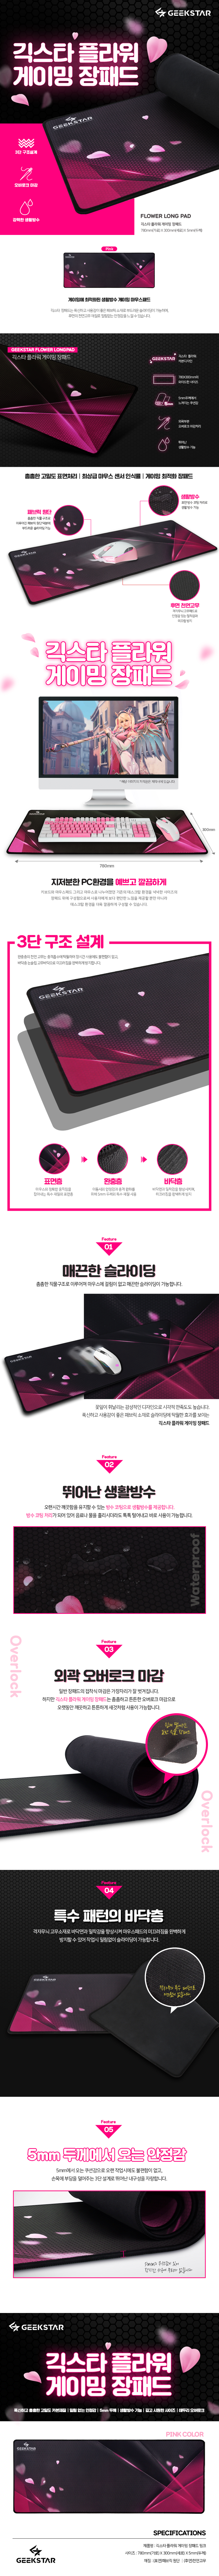 flower_longpad_pink_1